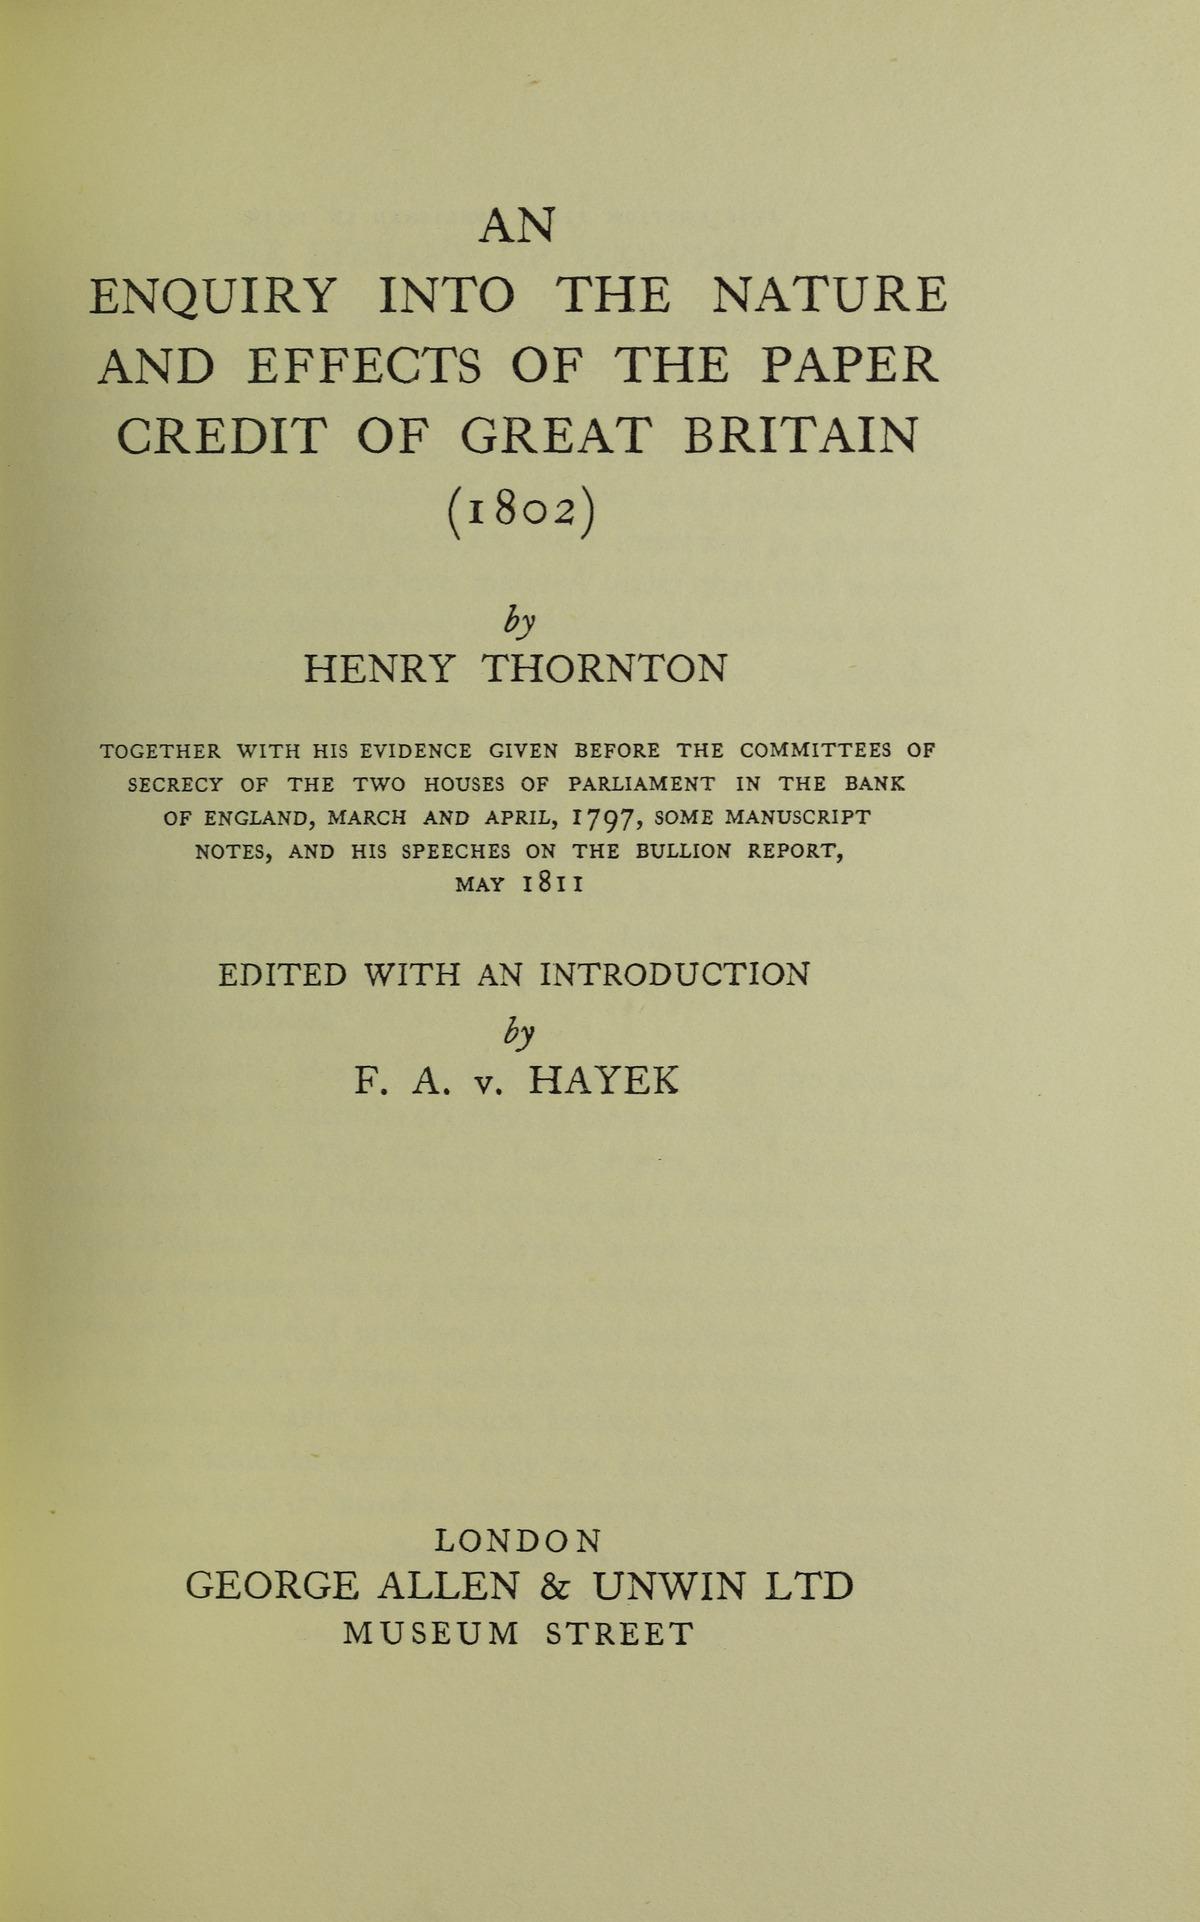 Henry Thornton reformer